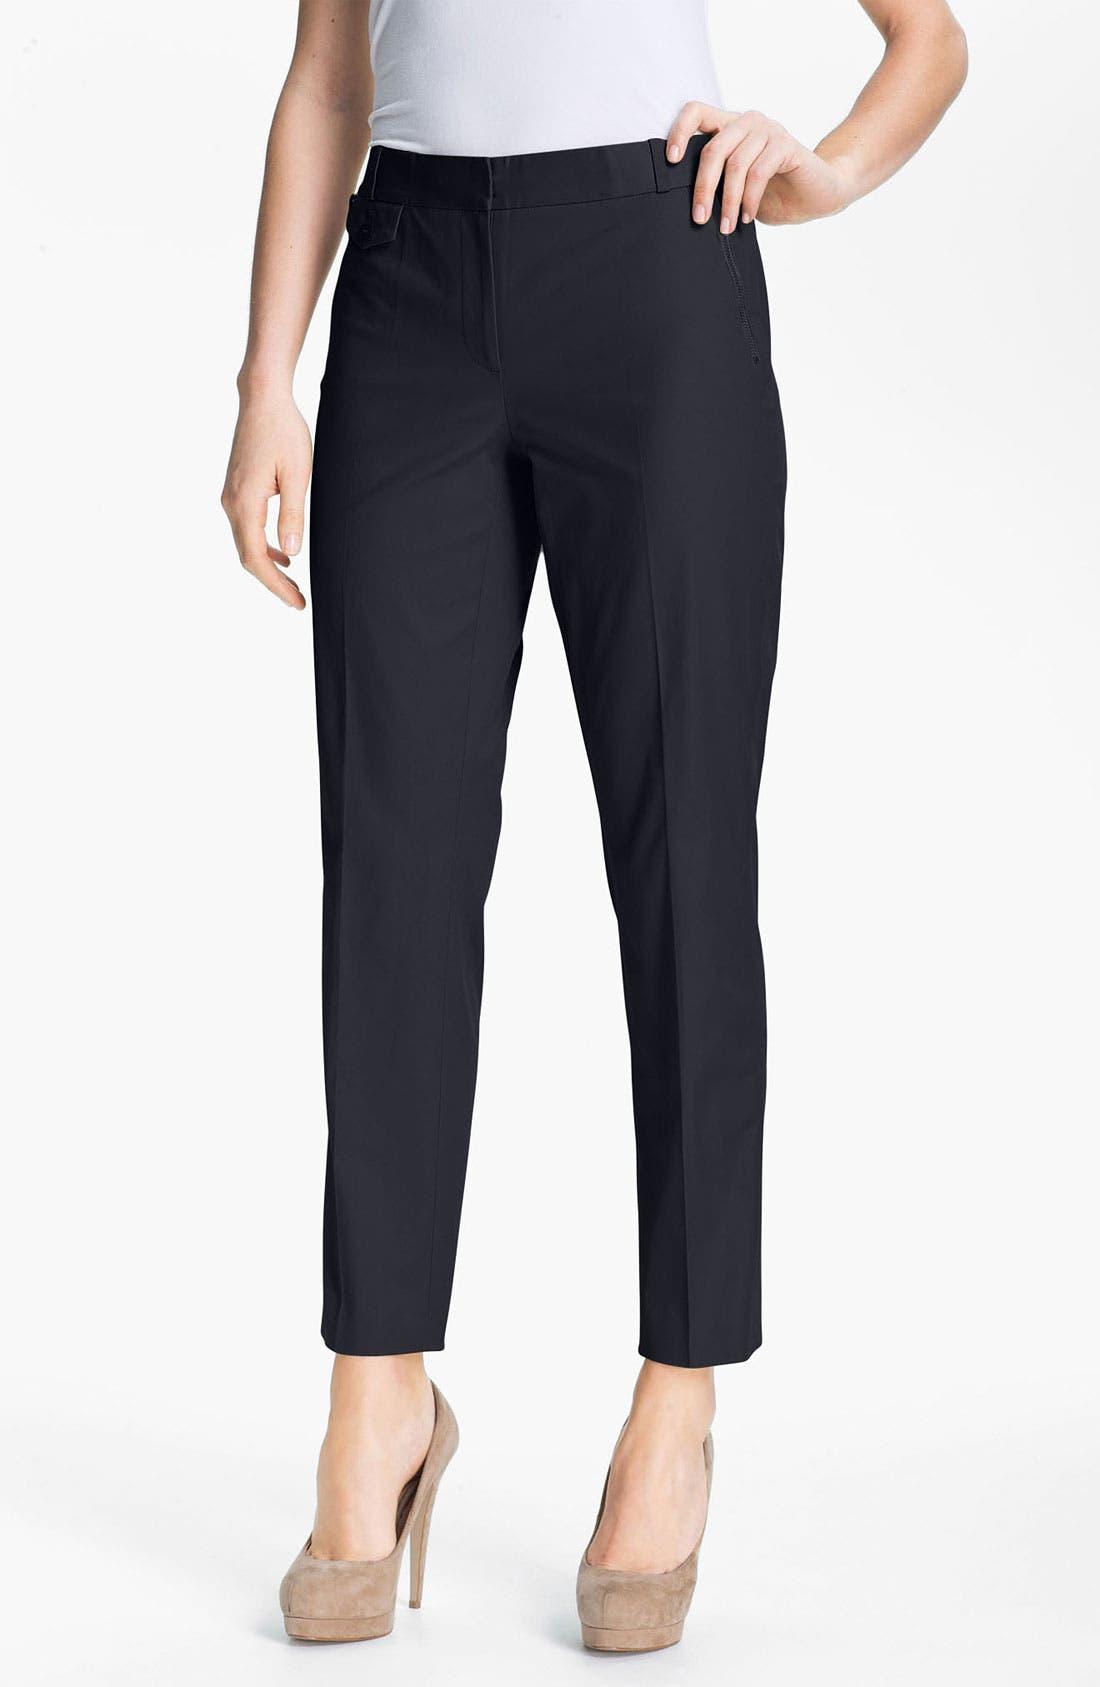 Main Image - Classiques Entier® 'New Chicca' Ankle Pants